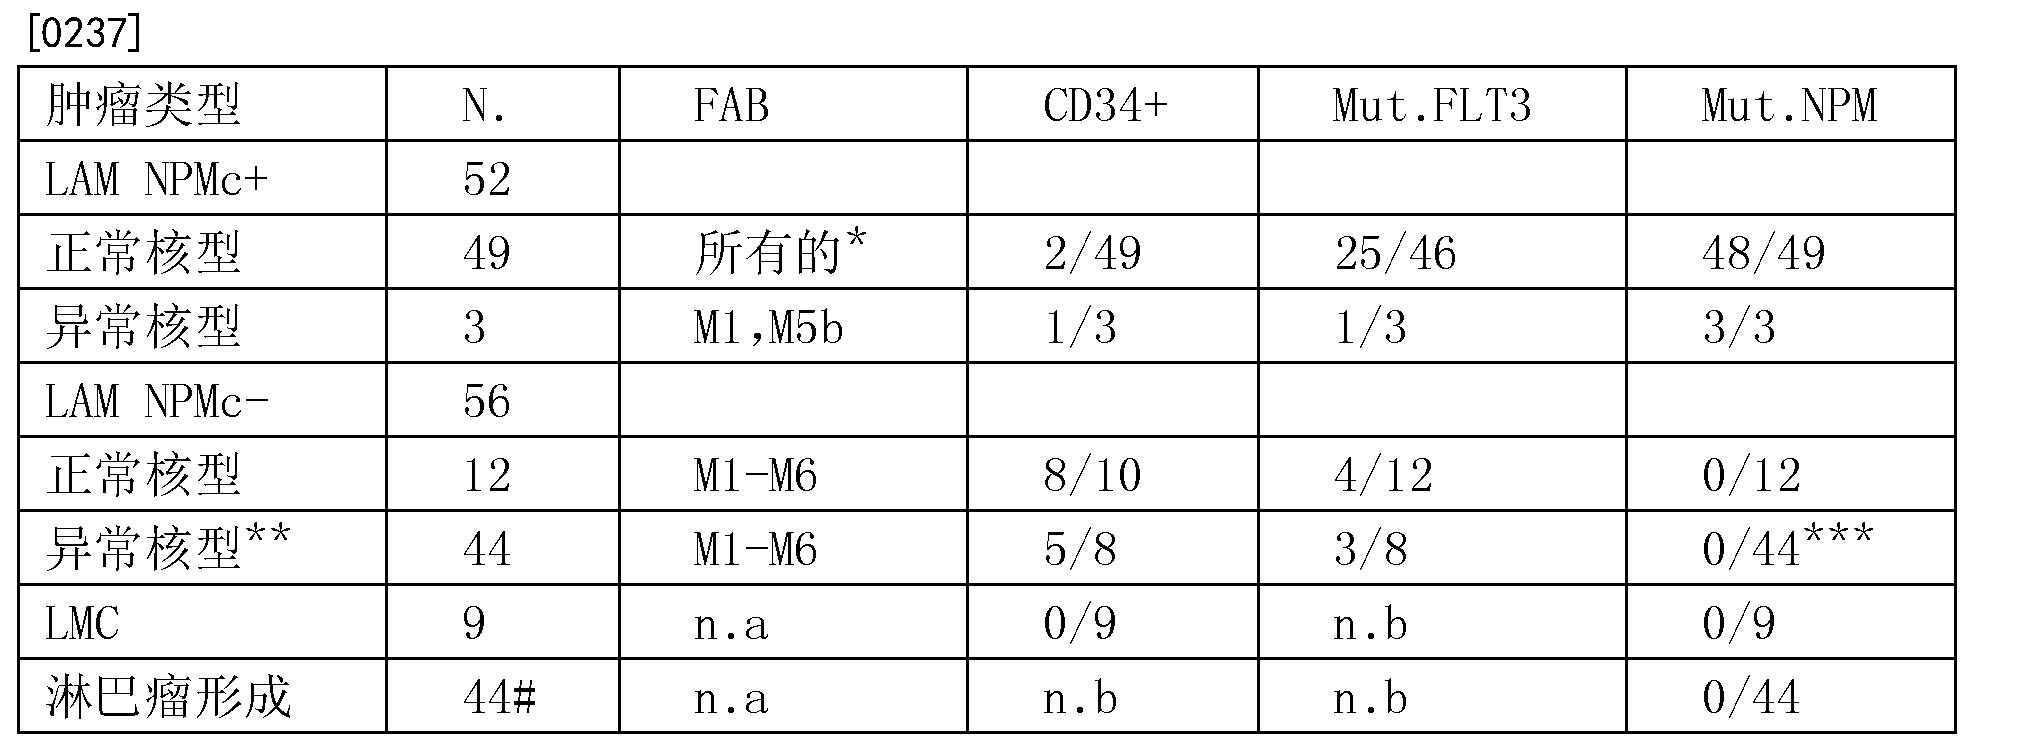 CN101160320B - Nucleophosmin protein (NPM) mutants